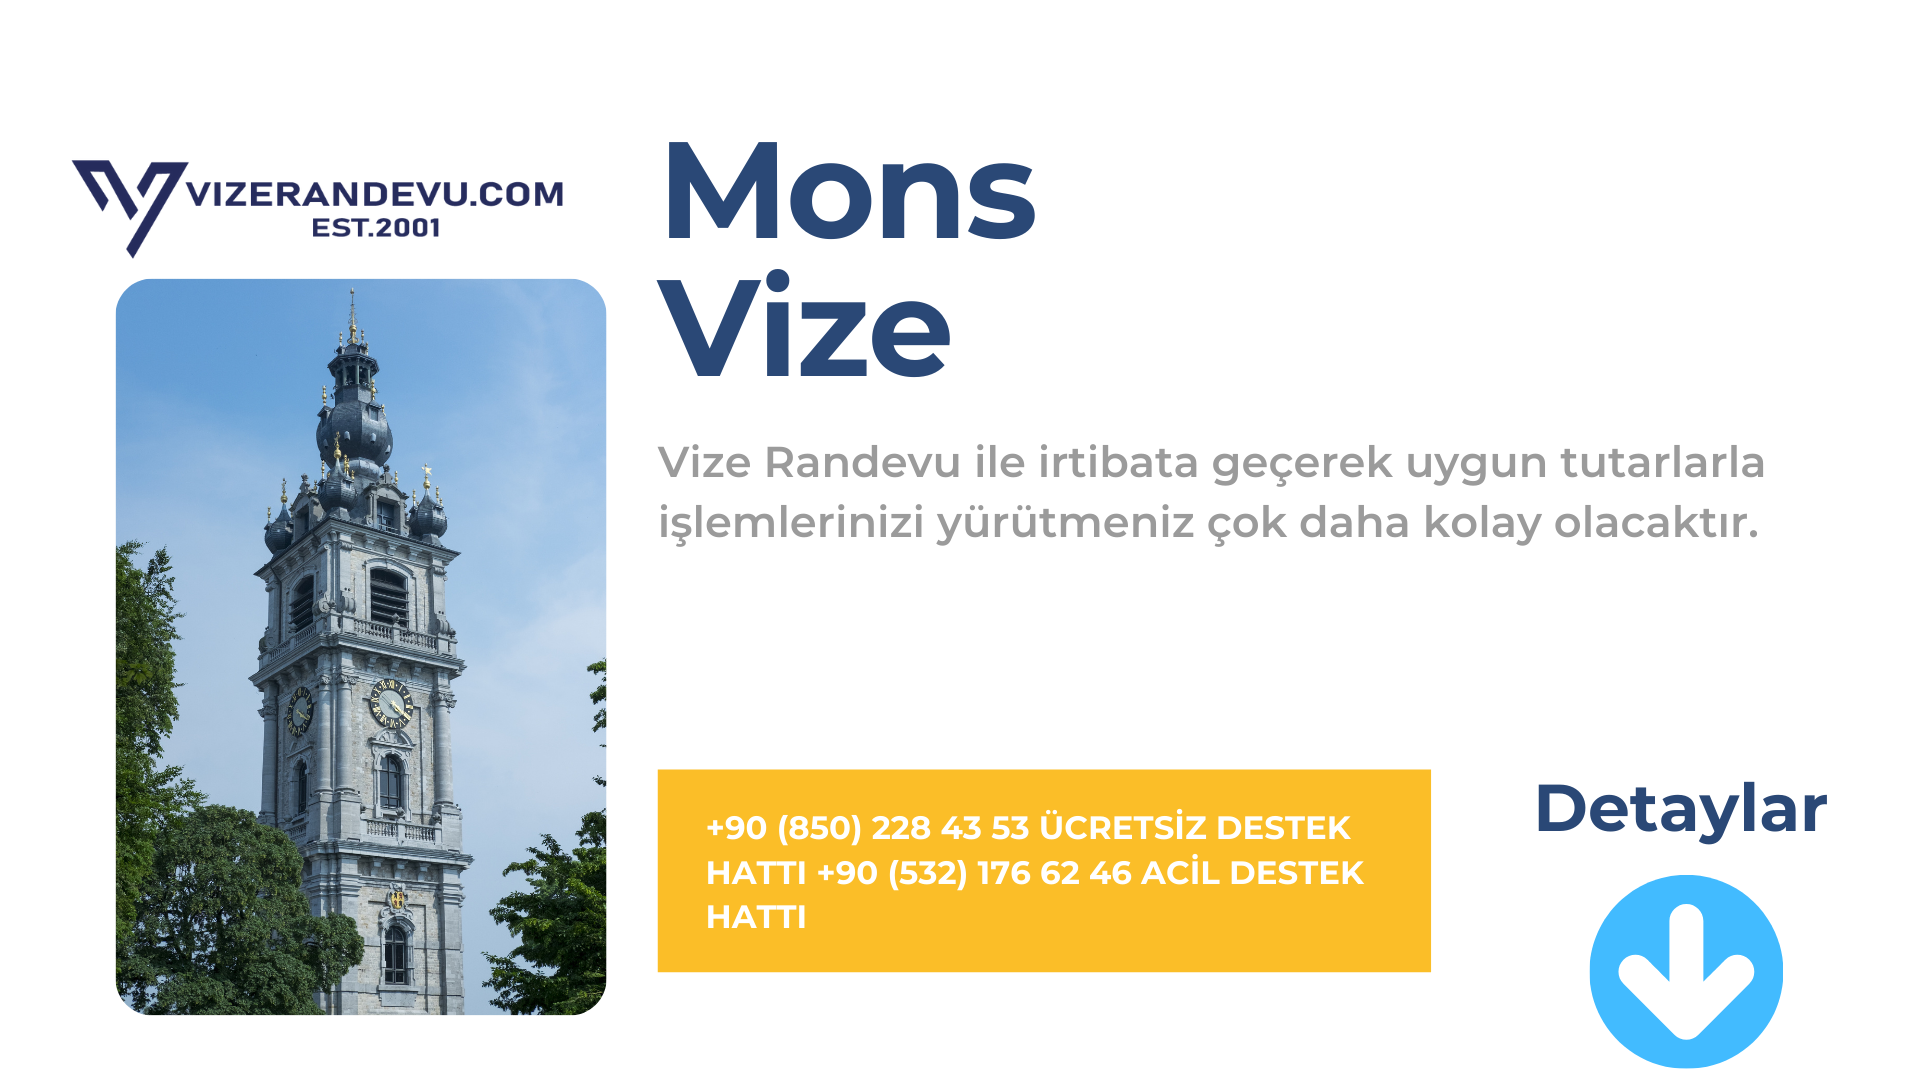 Mons Vize